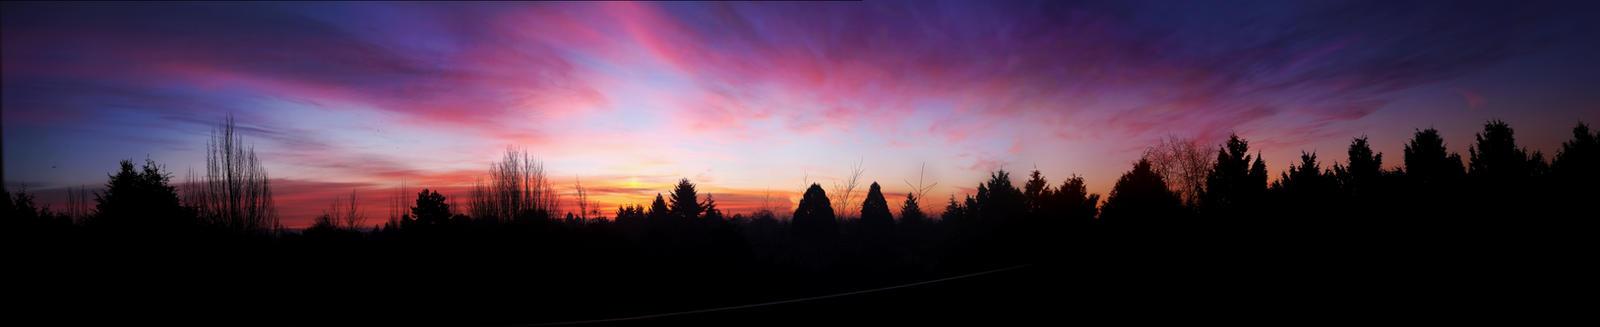 Vancouver Sky Sunrise Sunset Panoramic XL by dart47